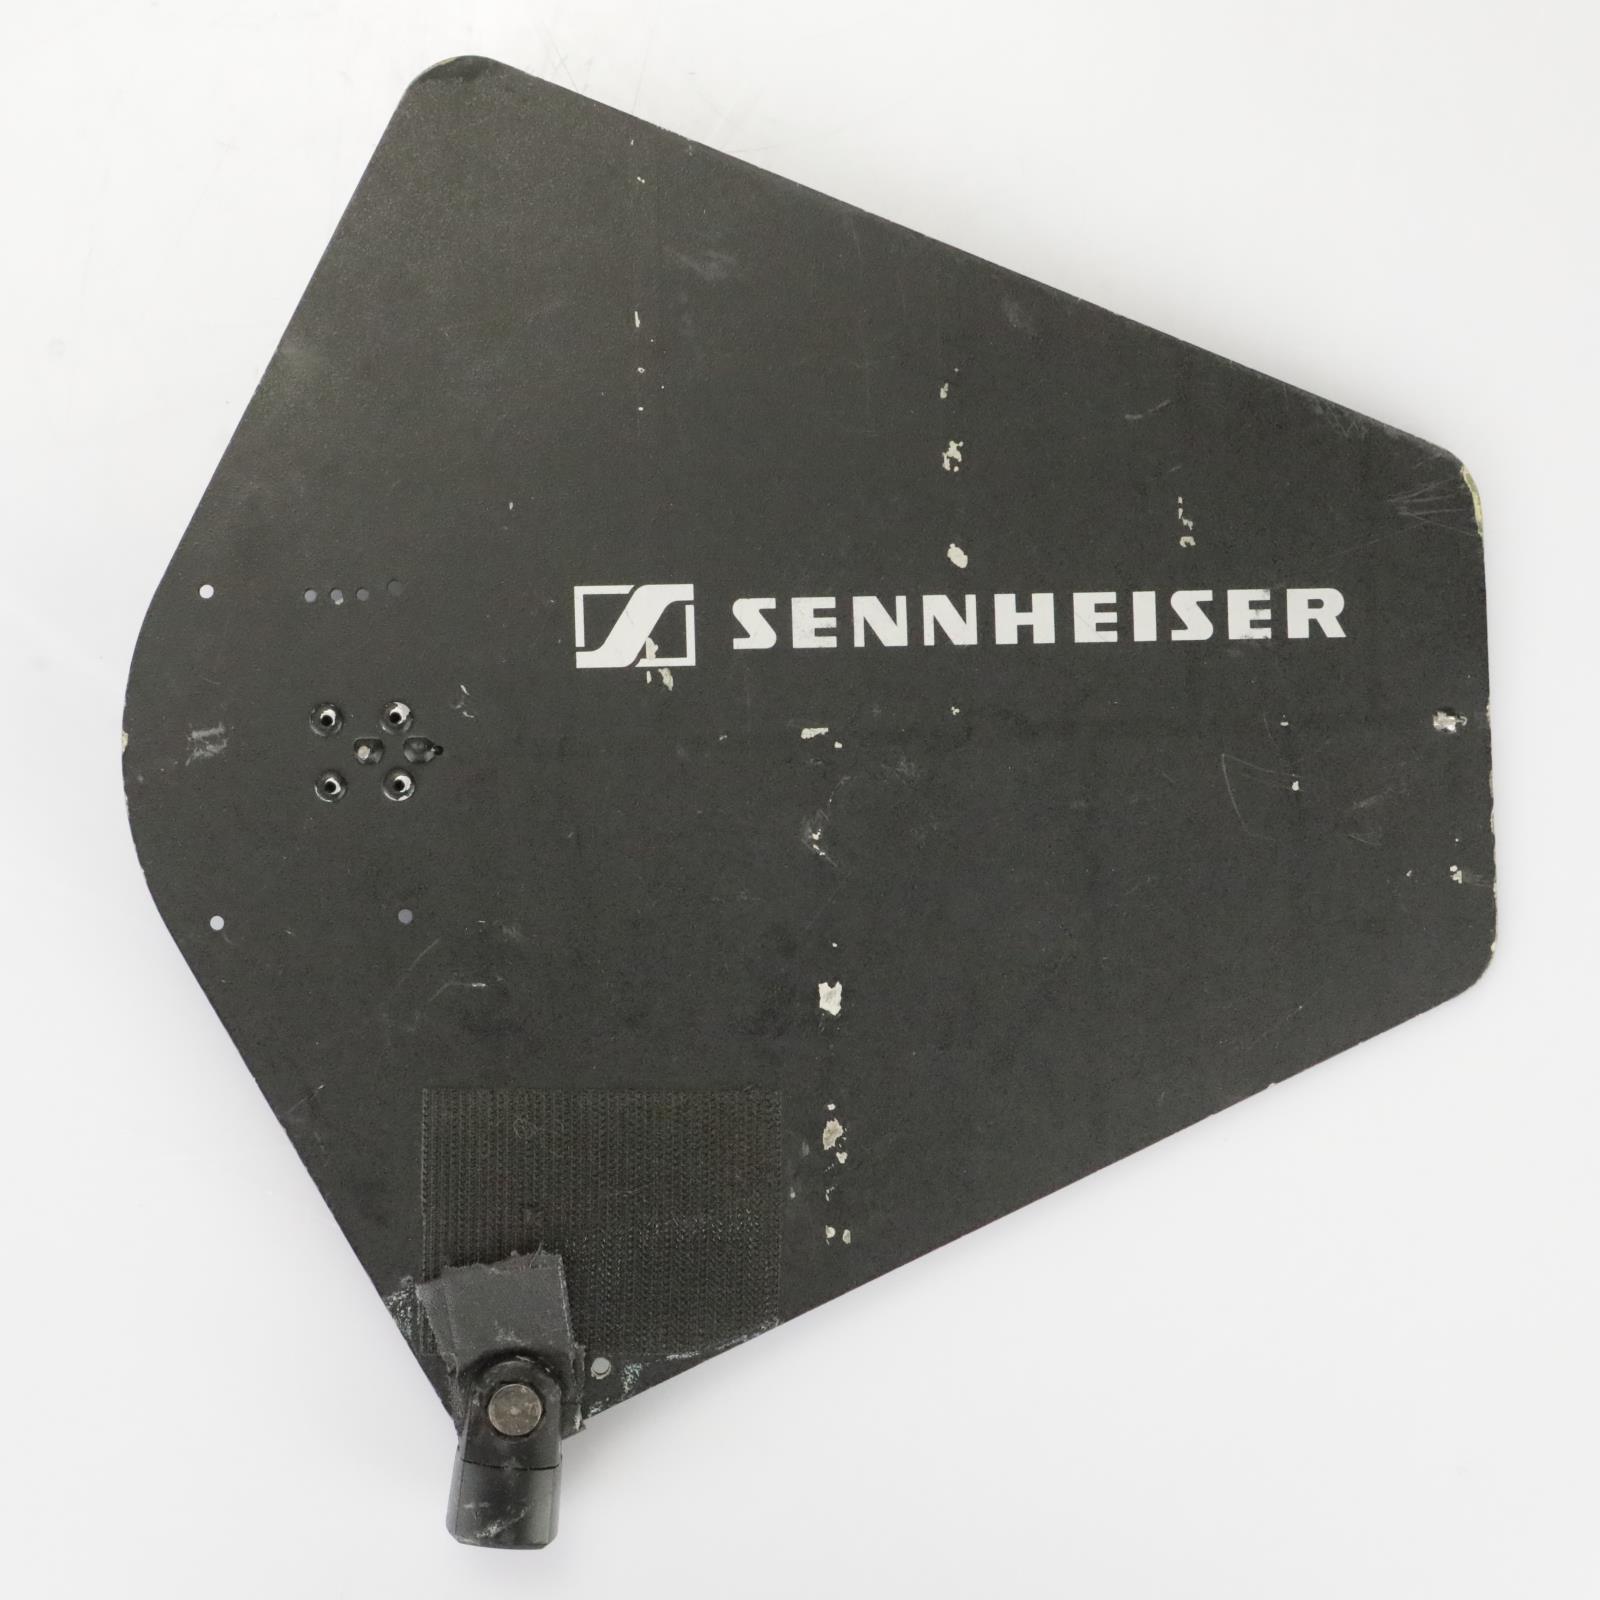 Sennheiser A 2003-UHF Passive Directional Antenna #39472